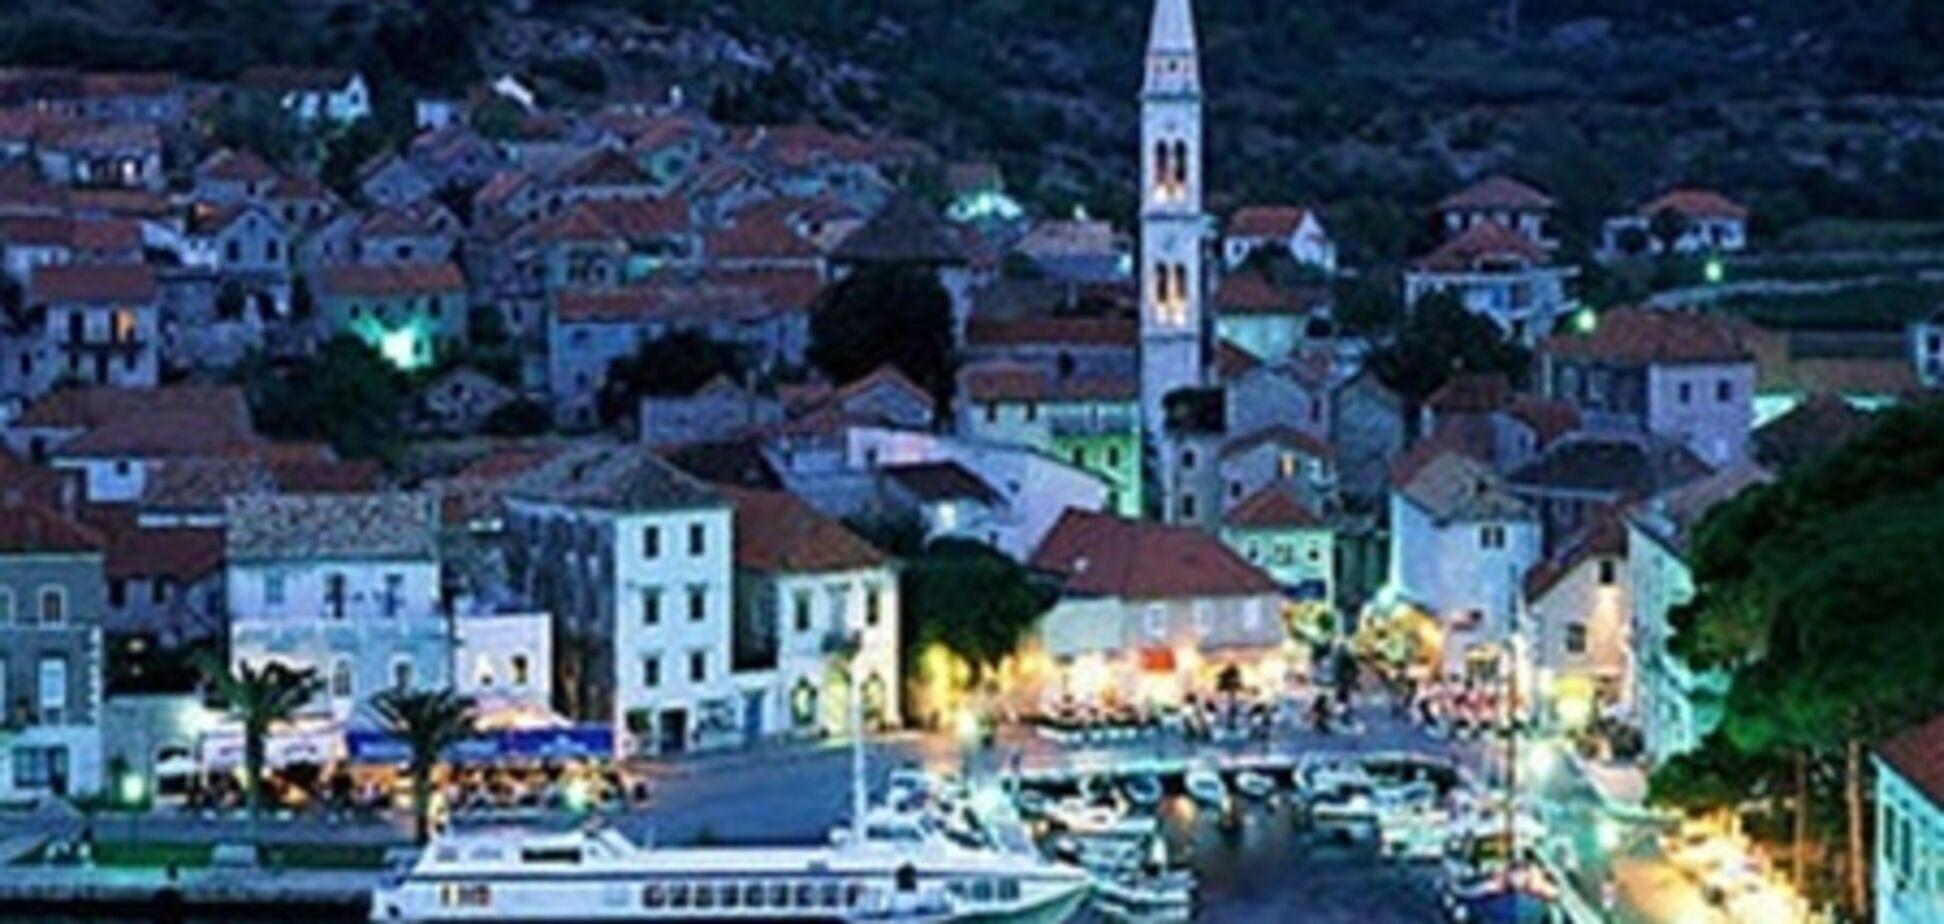 Недвижимость Хорватии подешевела на 30%